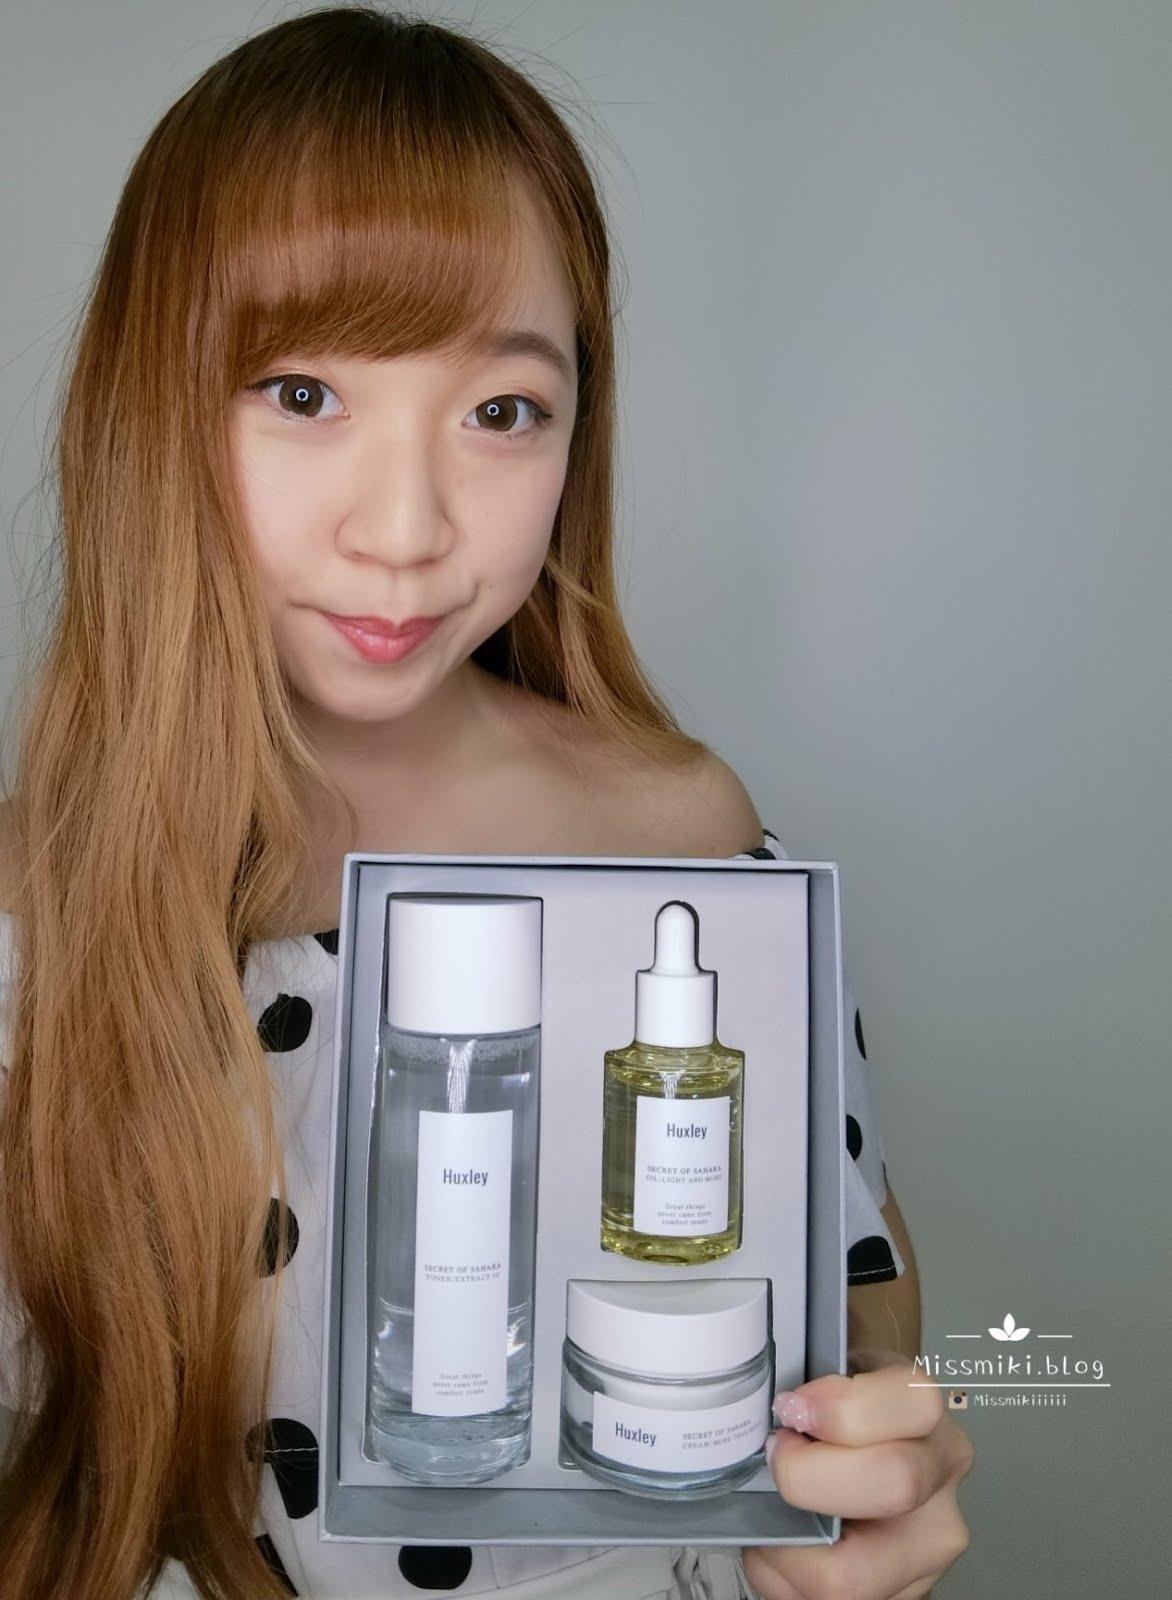 2f7208abaa Beautylife HK - 仙人掌種子護膚品?|莎莎都有得賣|韓國天然有機護膚品 ...